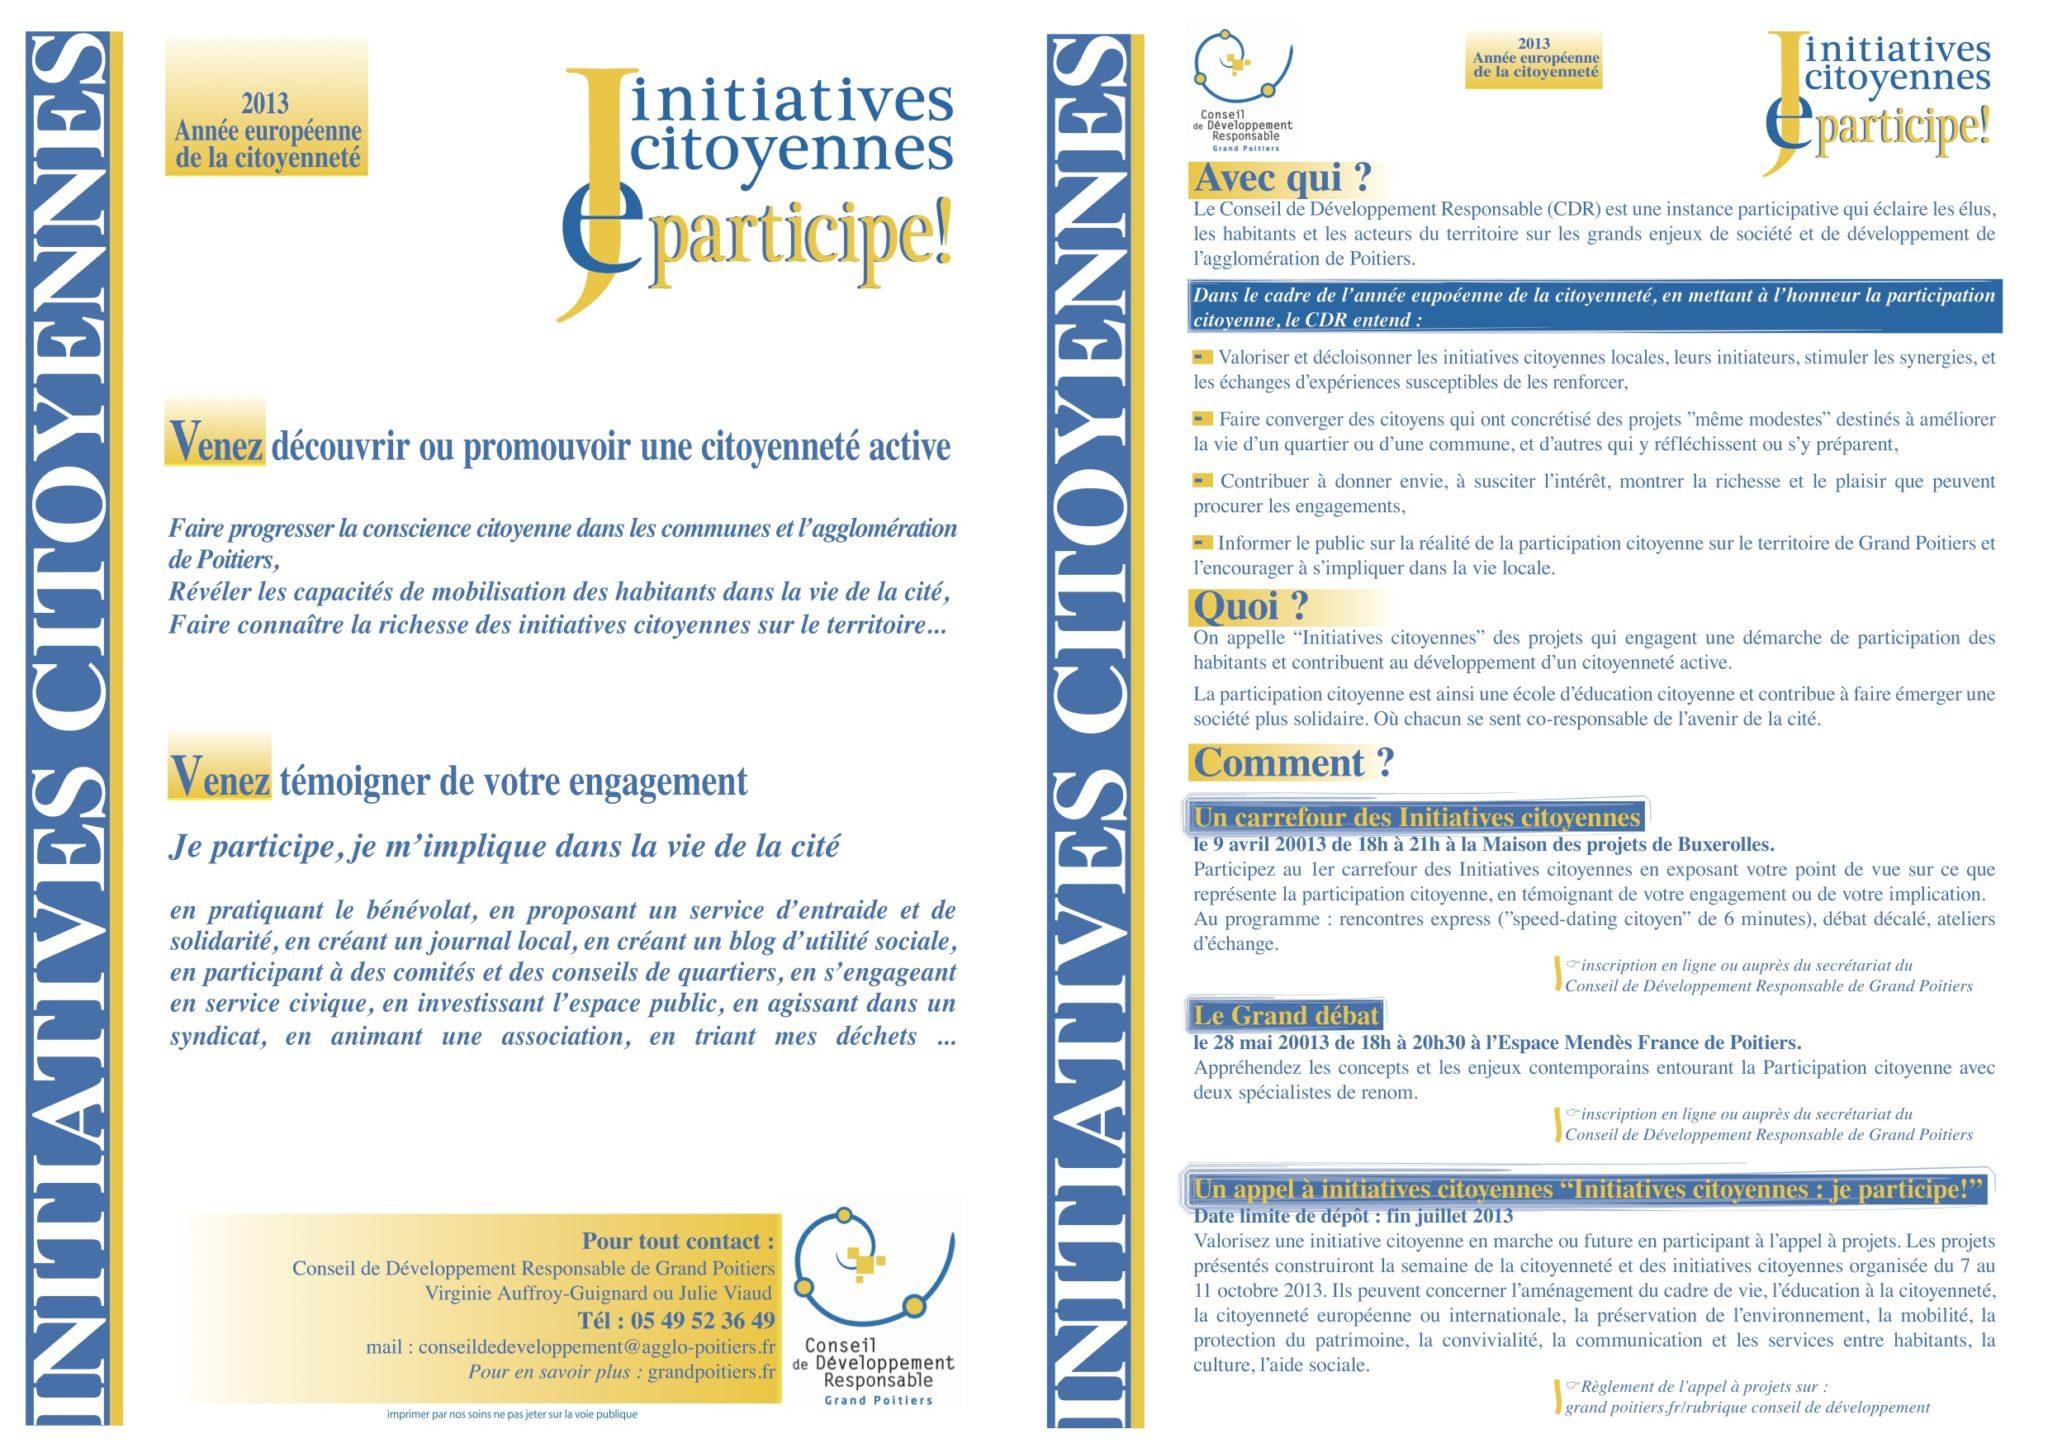 ProgramVFInititiativescitoyennes